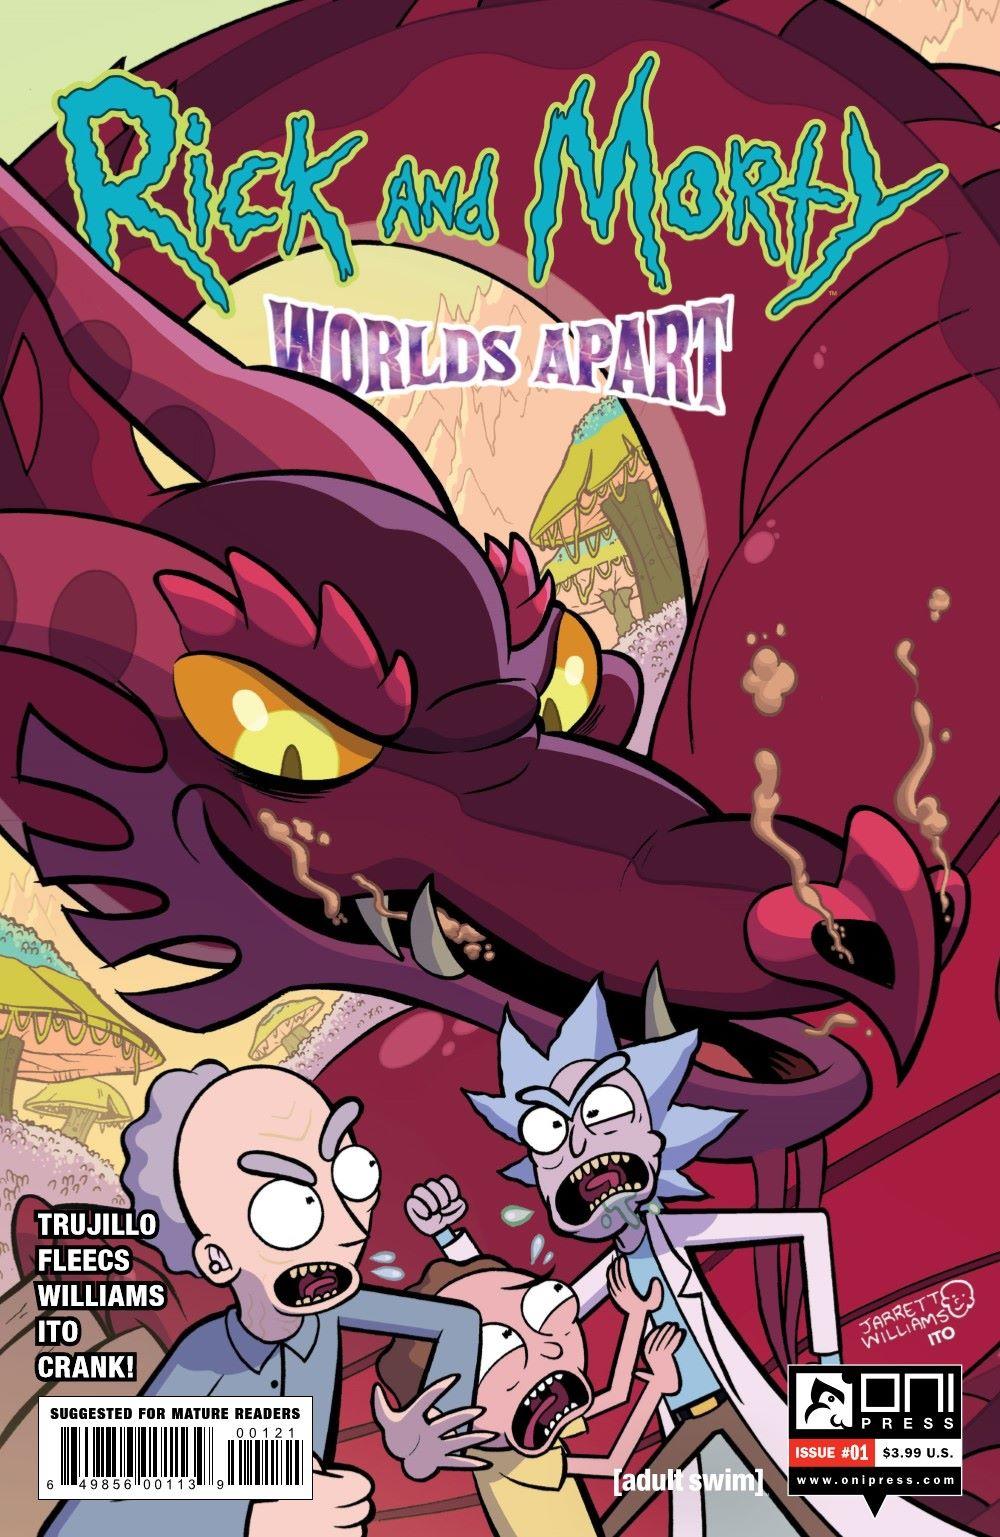 RICKMORTY-WORLDSAPART-1-MARKETING-02 ComicList Previews: RICK AND MORTY WORLDS APART #1